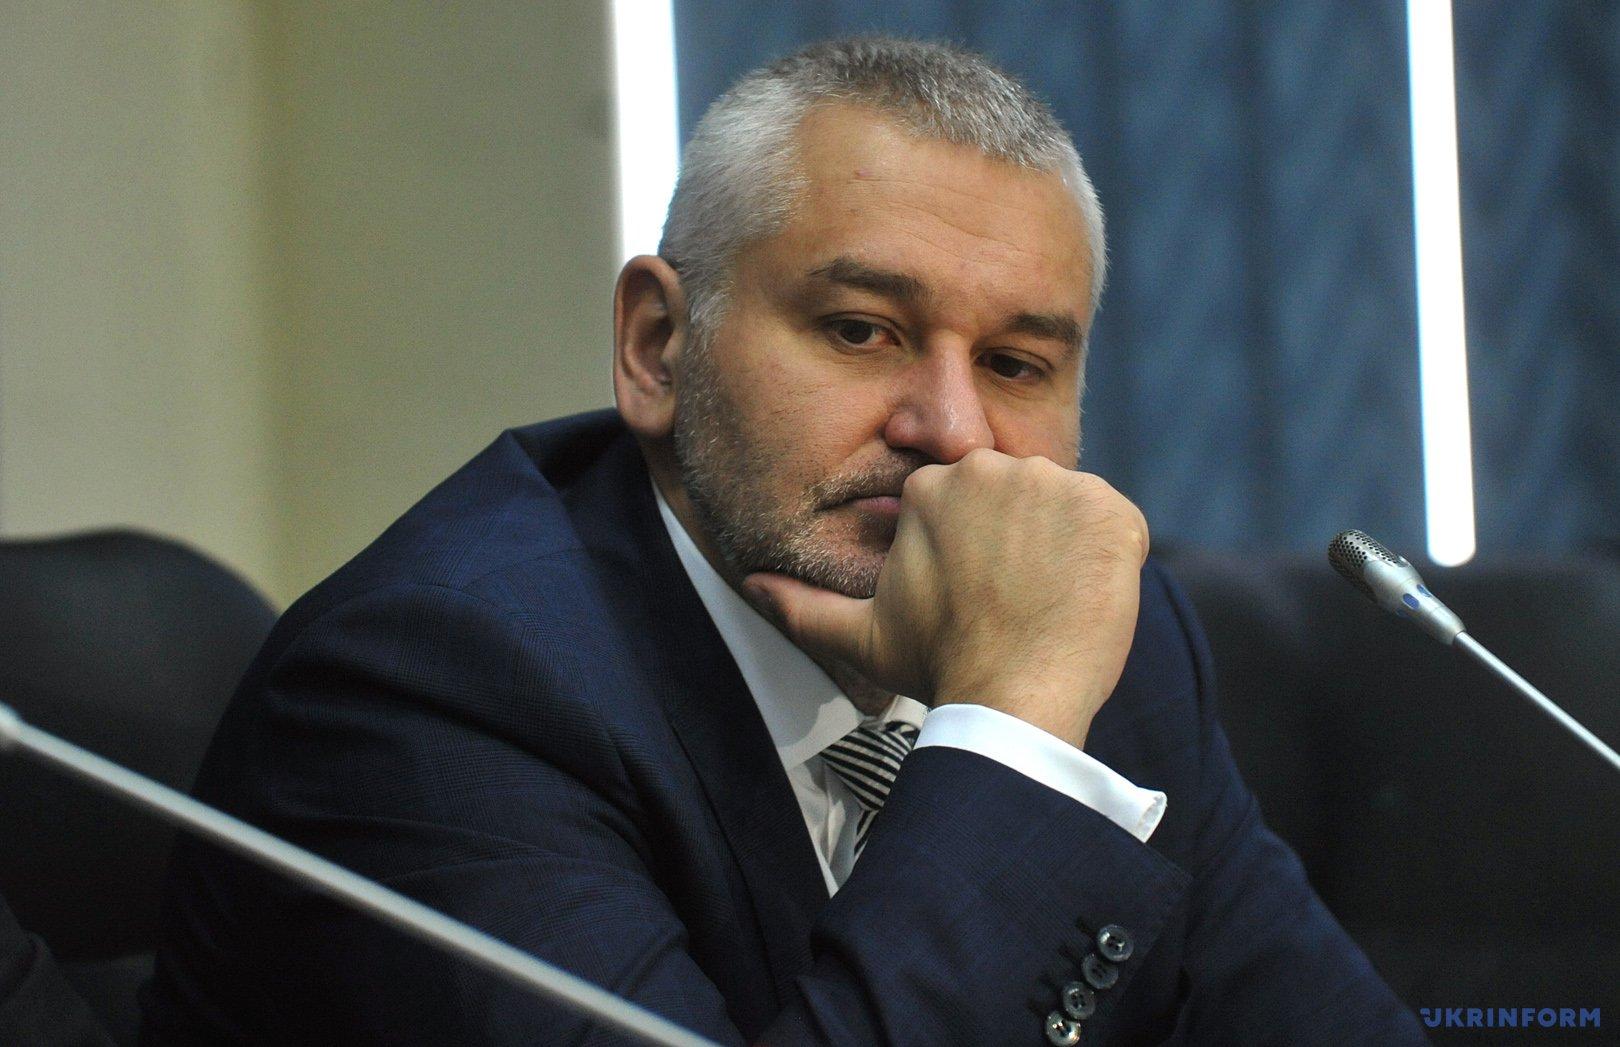 Ilya Rezniks lawyer posted a shocking photo of a sick poet online 12.09.2012